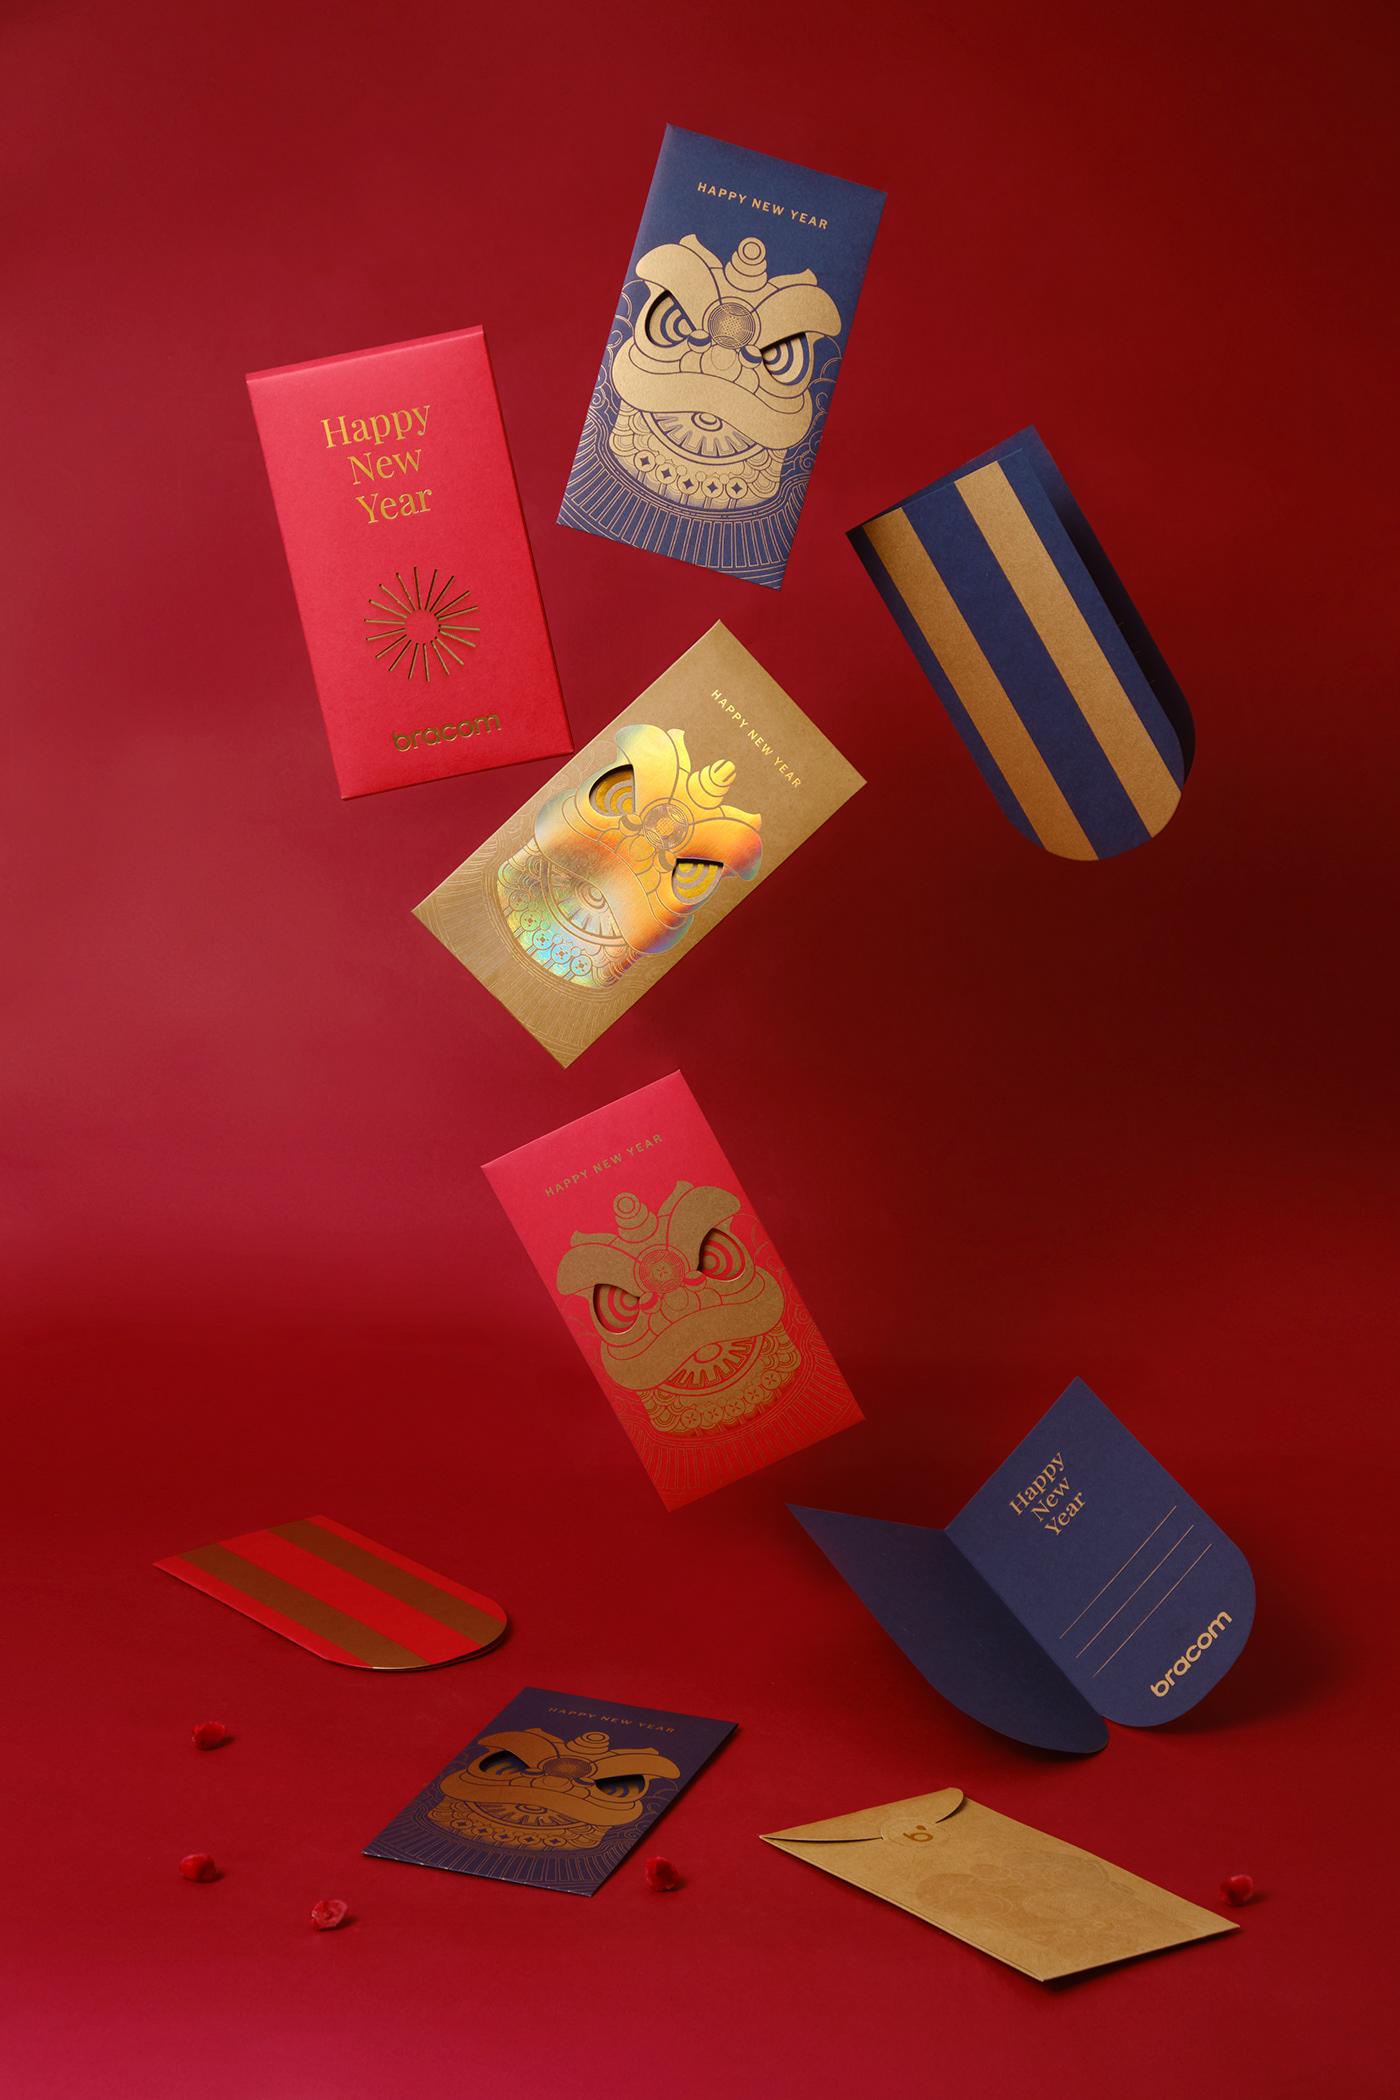 bracom bracom agency chinese new year envelope Lunar New Year Packaging Red Envelope unicorn vietnam red